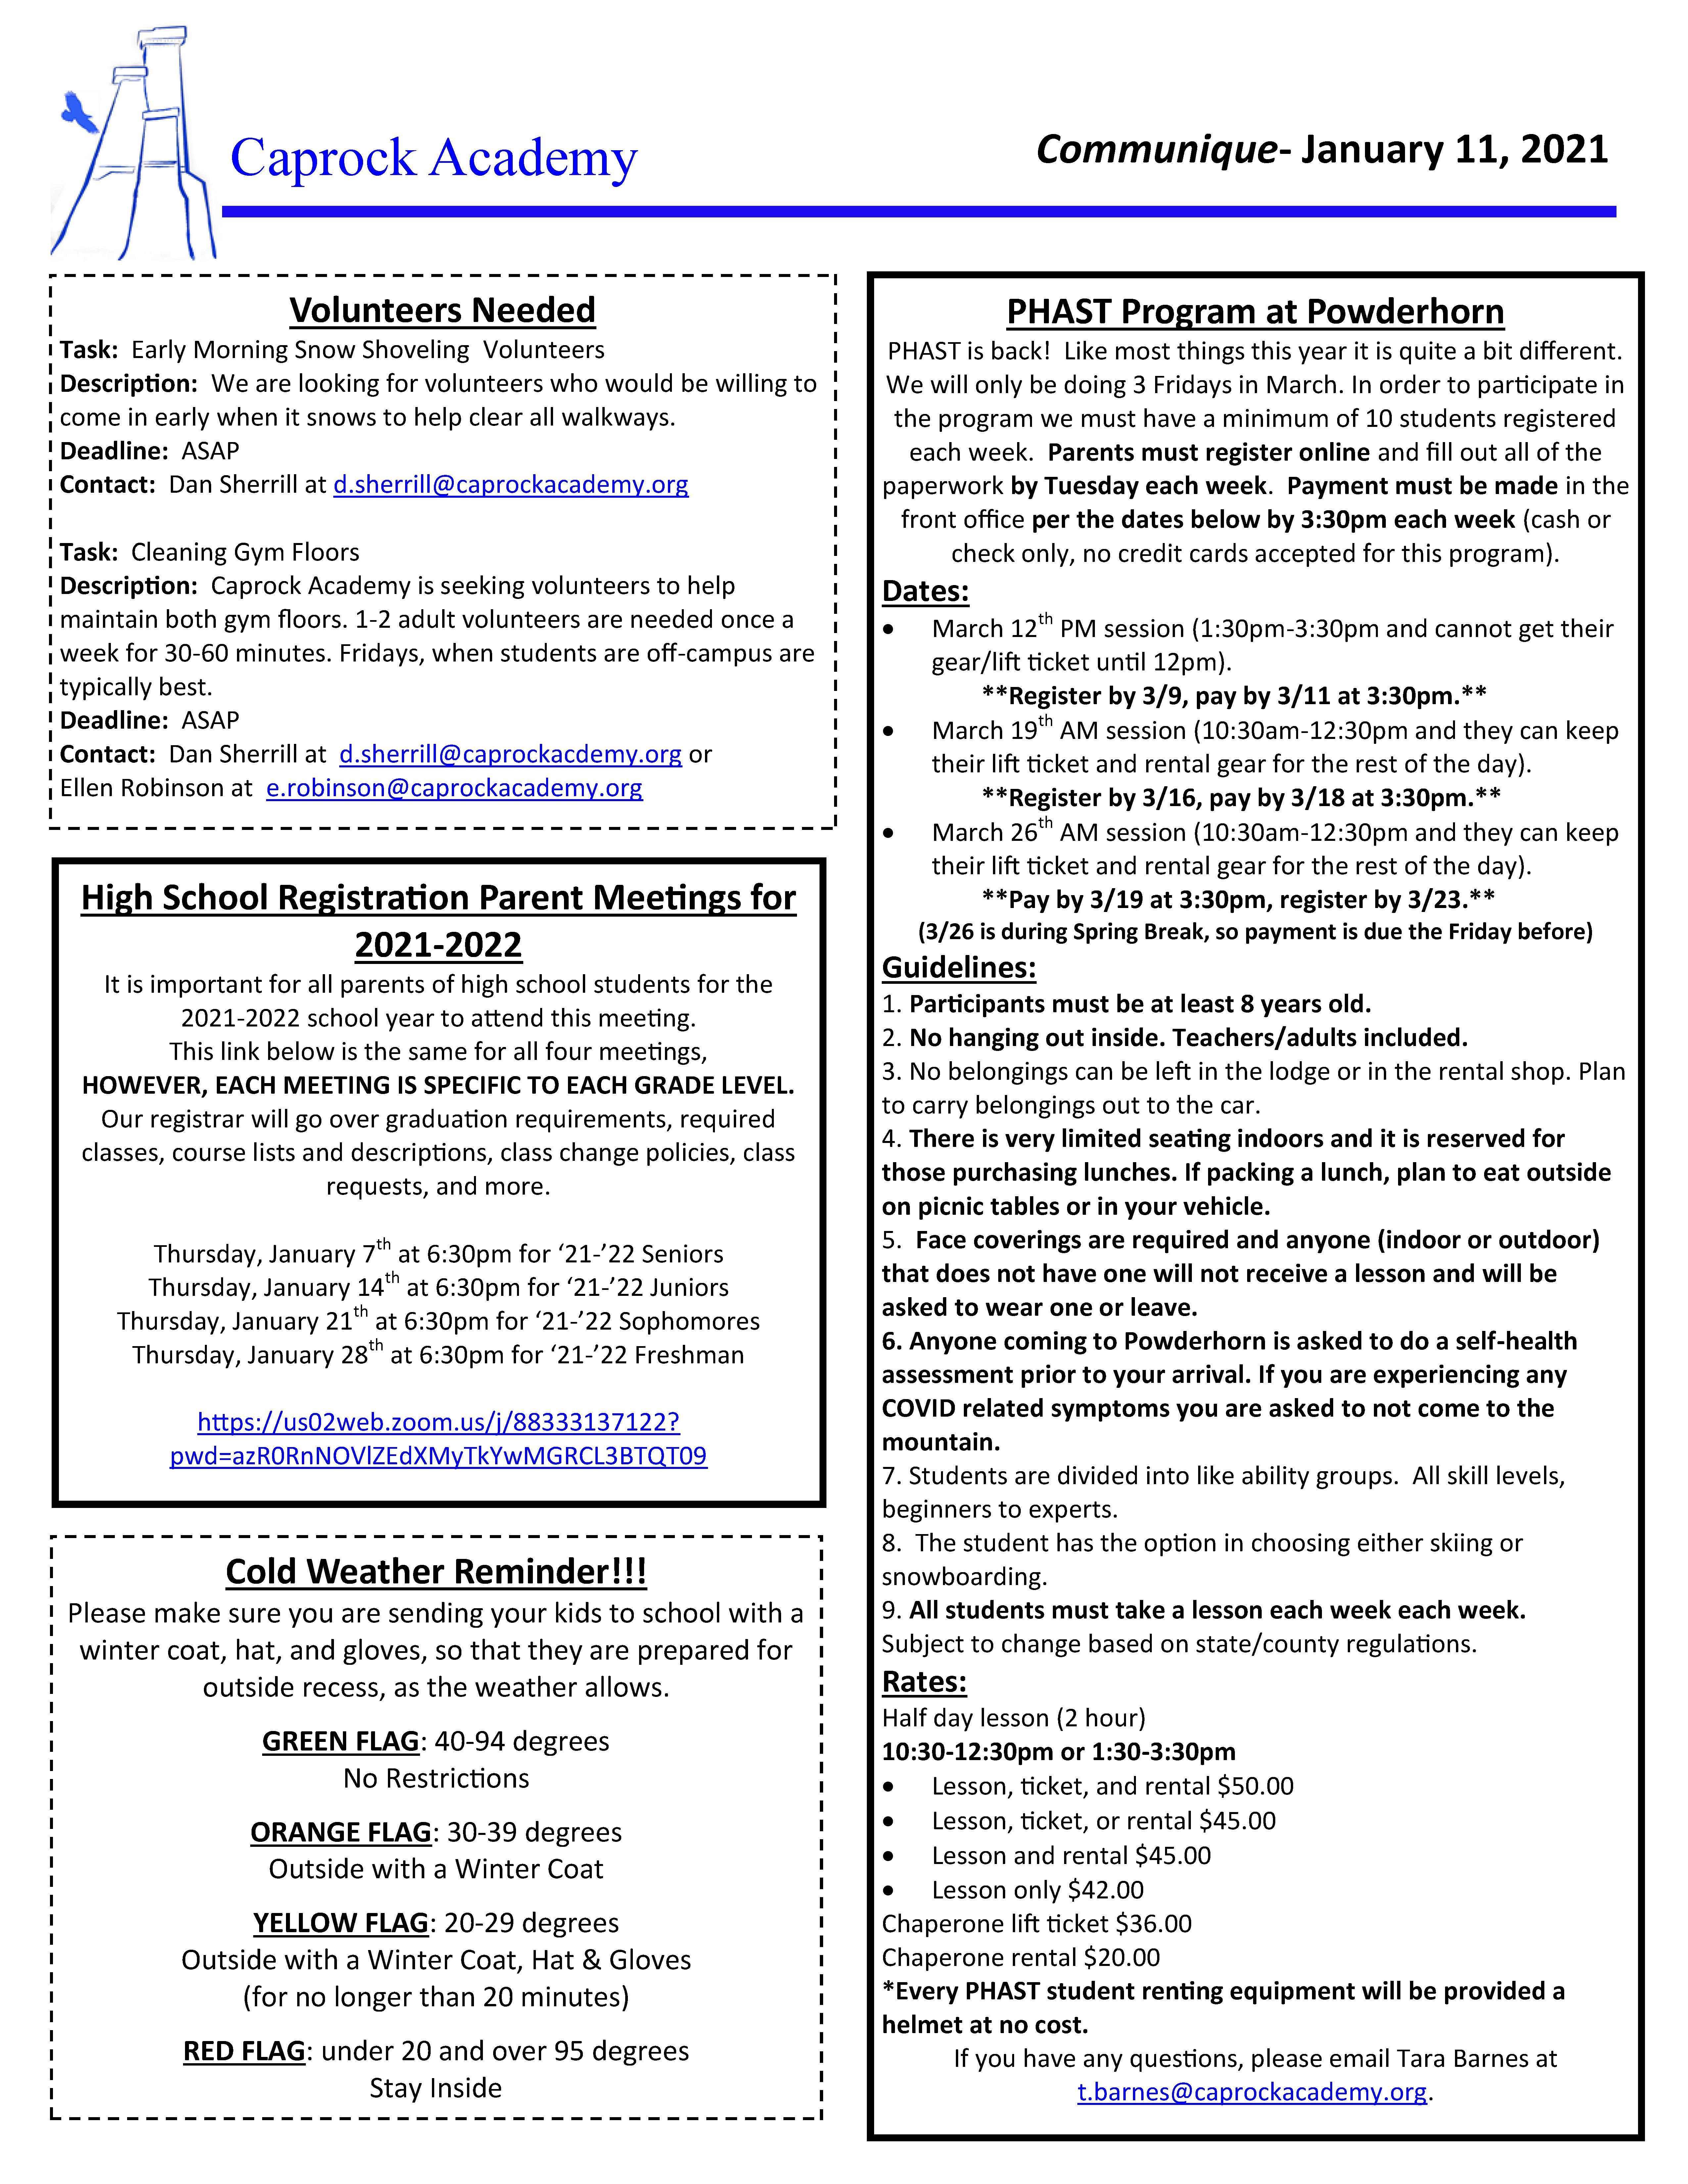 CA Communique 1-11-2021 page 2